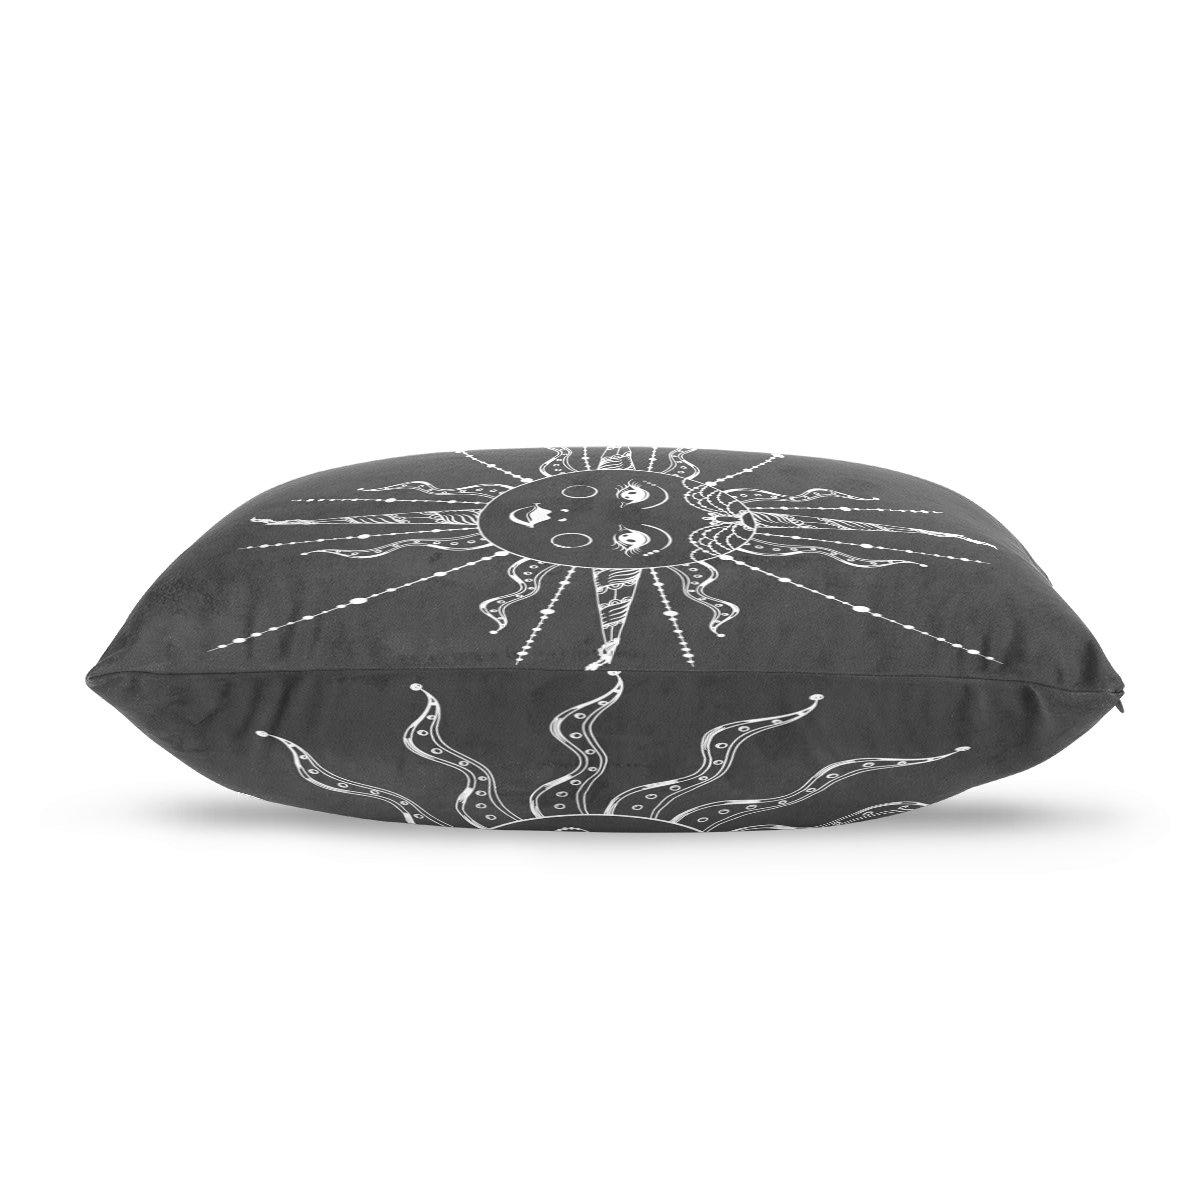 Amazon.com: Dragon Sword Boho - Funda de almohada elegante ...